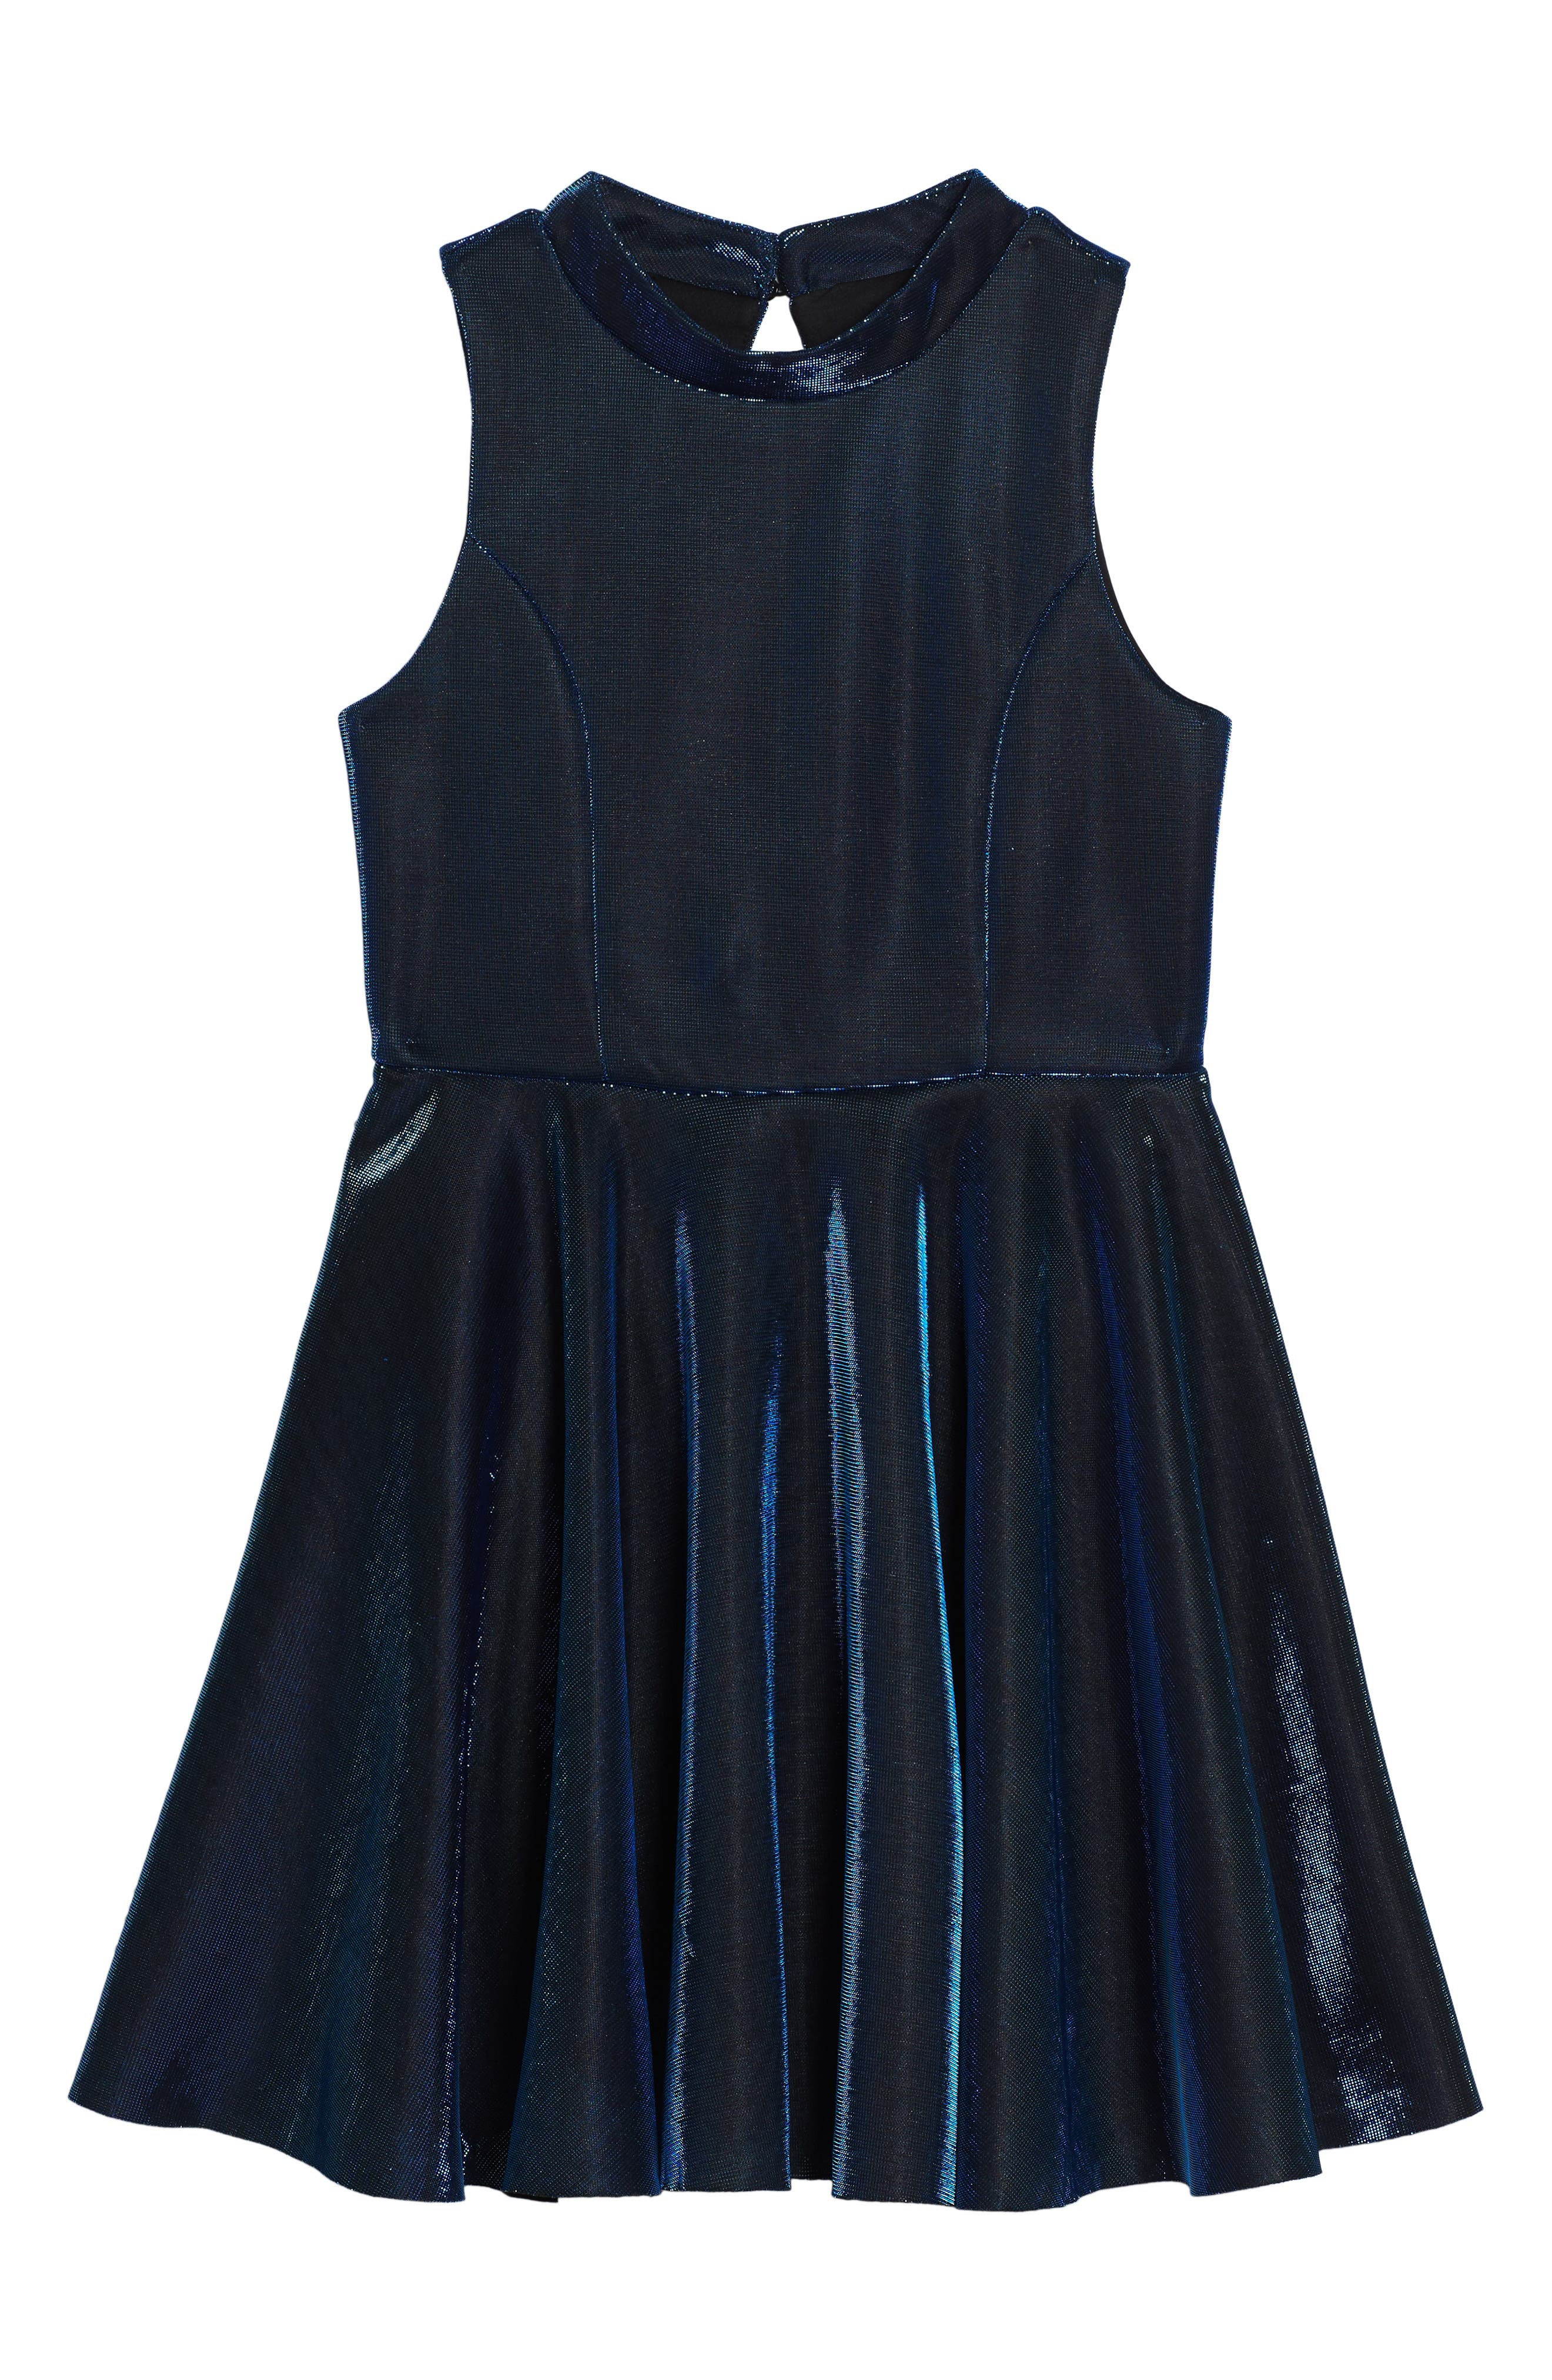 Iridescent Techno Skater Dress,                         Main,                         color, 420